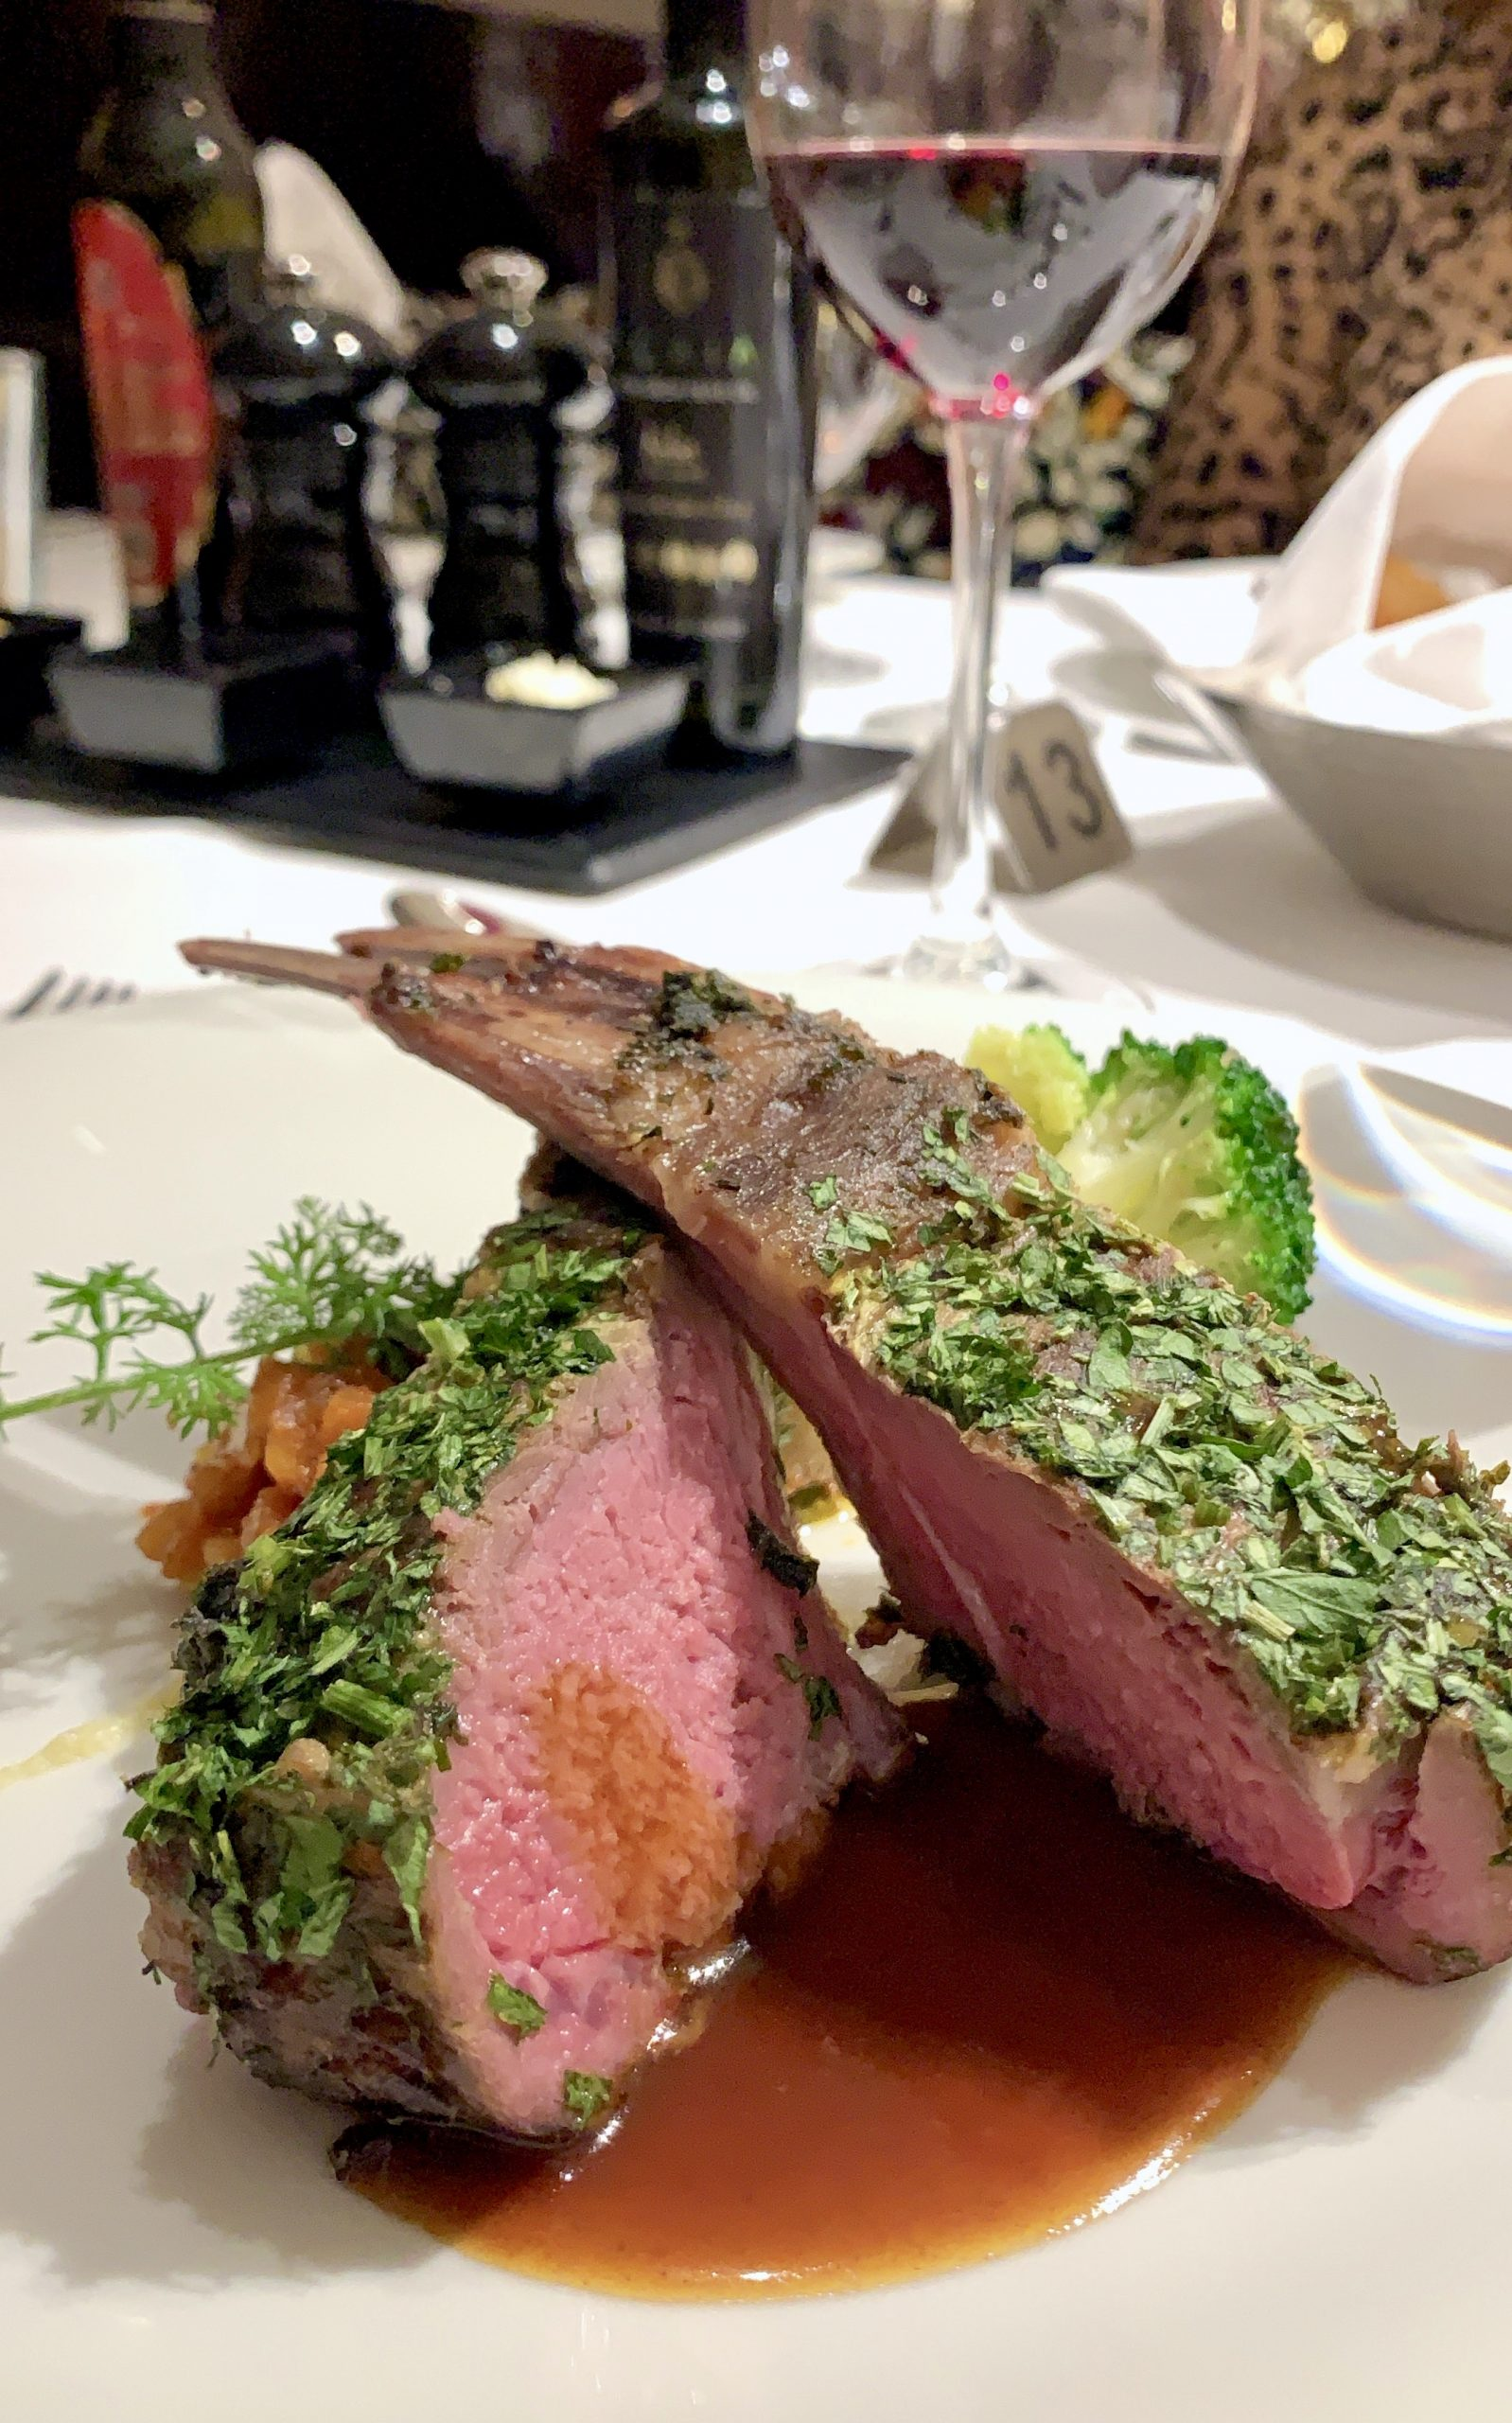 Chaine de Rotisseurs dinner lamb